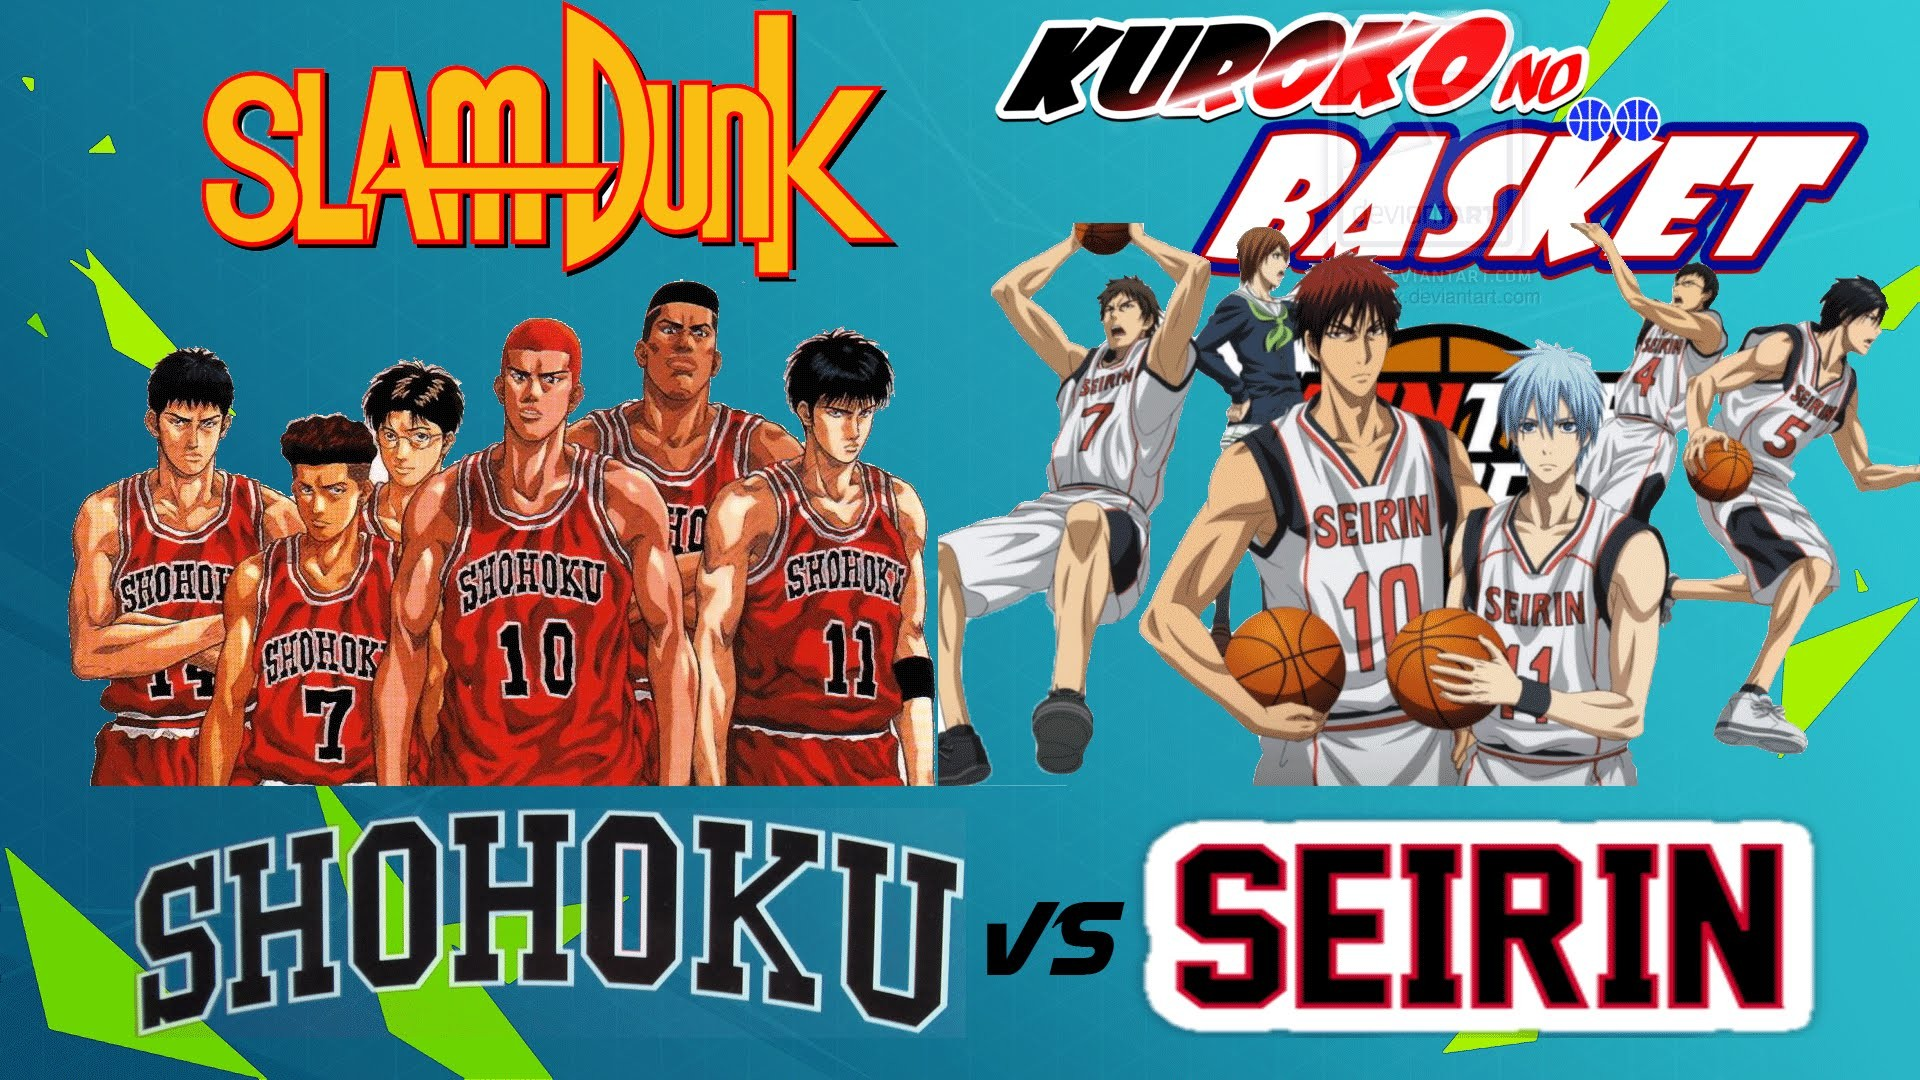 SHOHOKU vs SEIRIN   1ª Parte   Crossover Slam Dunk vs Kuroko no Basket    NBA 2k14 – YouTube